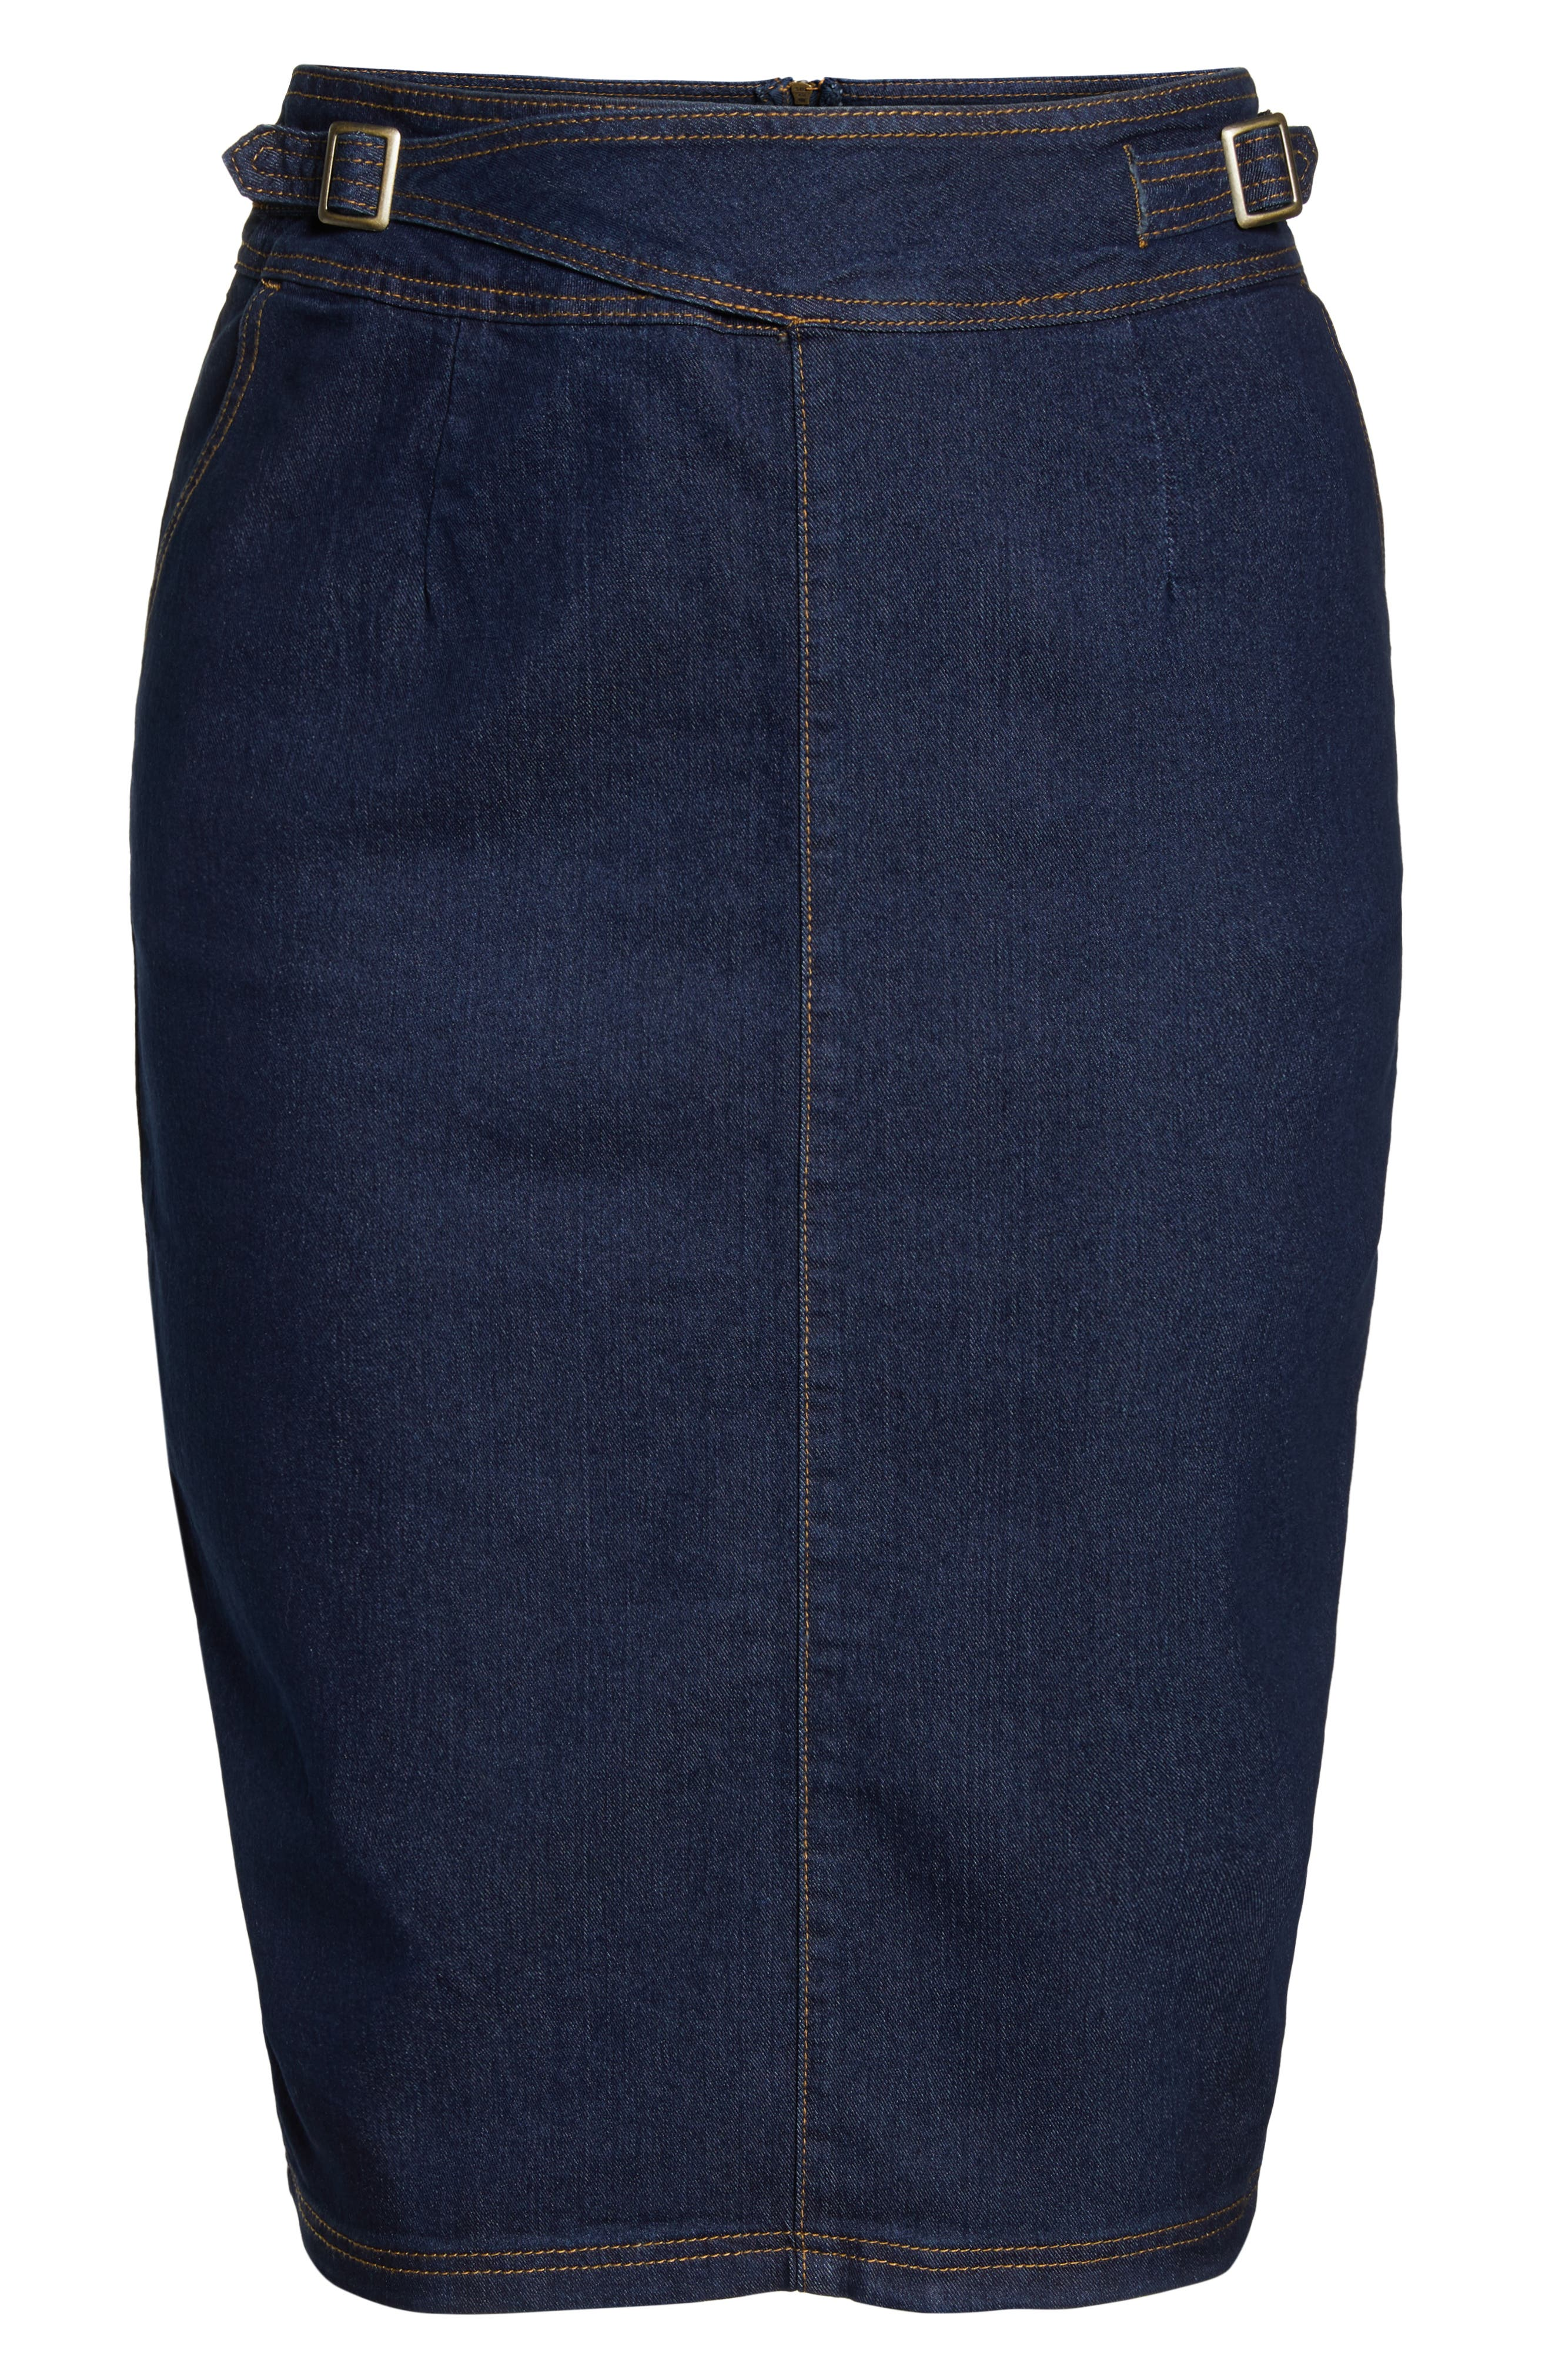 Denim Pencil Skirt,                             Alternate thumbnail 6, color,                             DARK DENIM